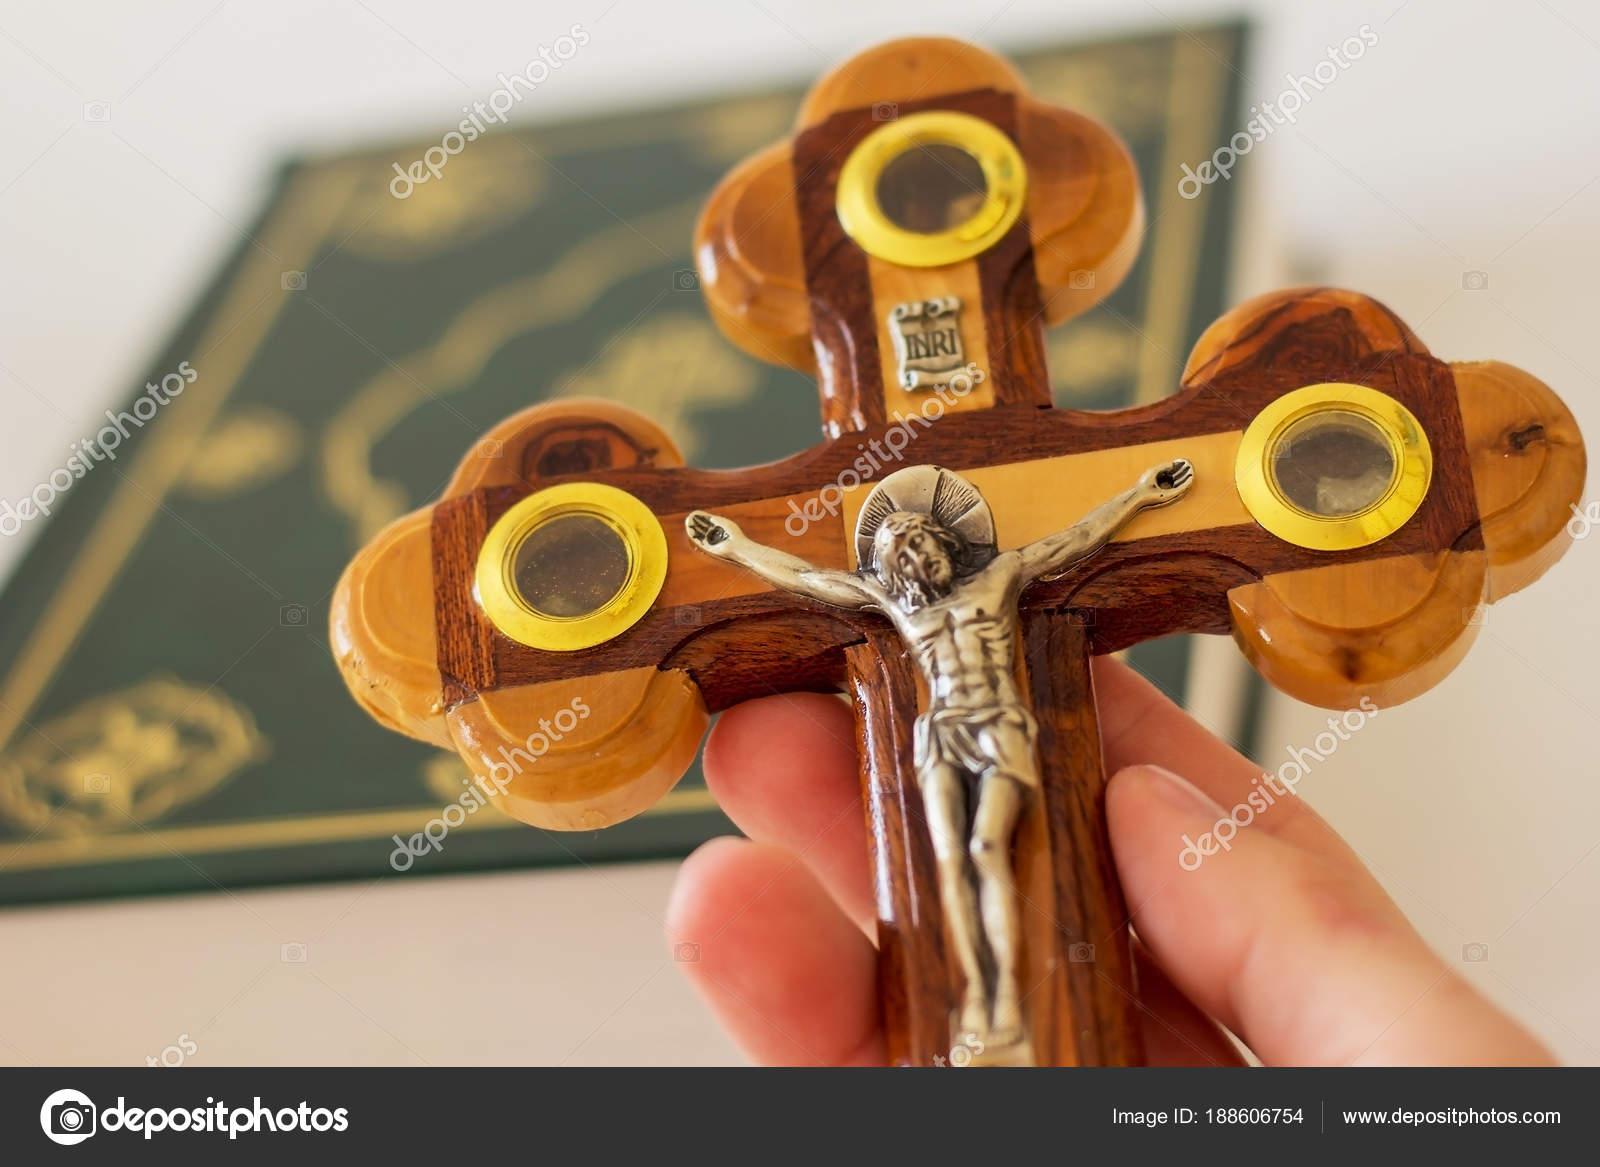 Hand Holding Cross Depicting Crucifixion Jesus Christ